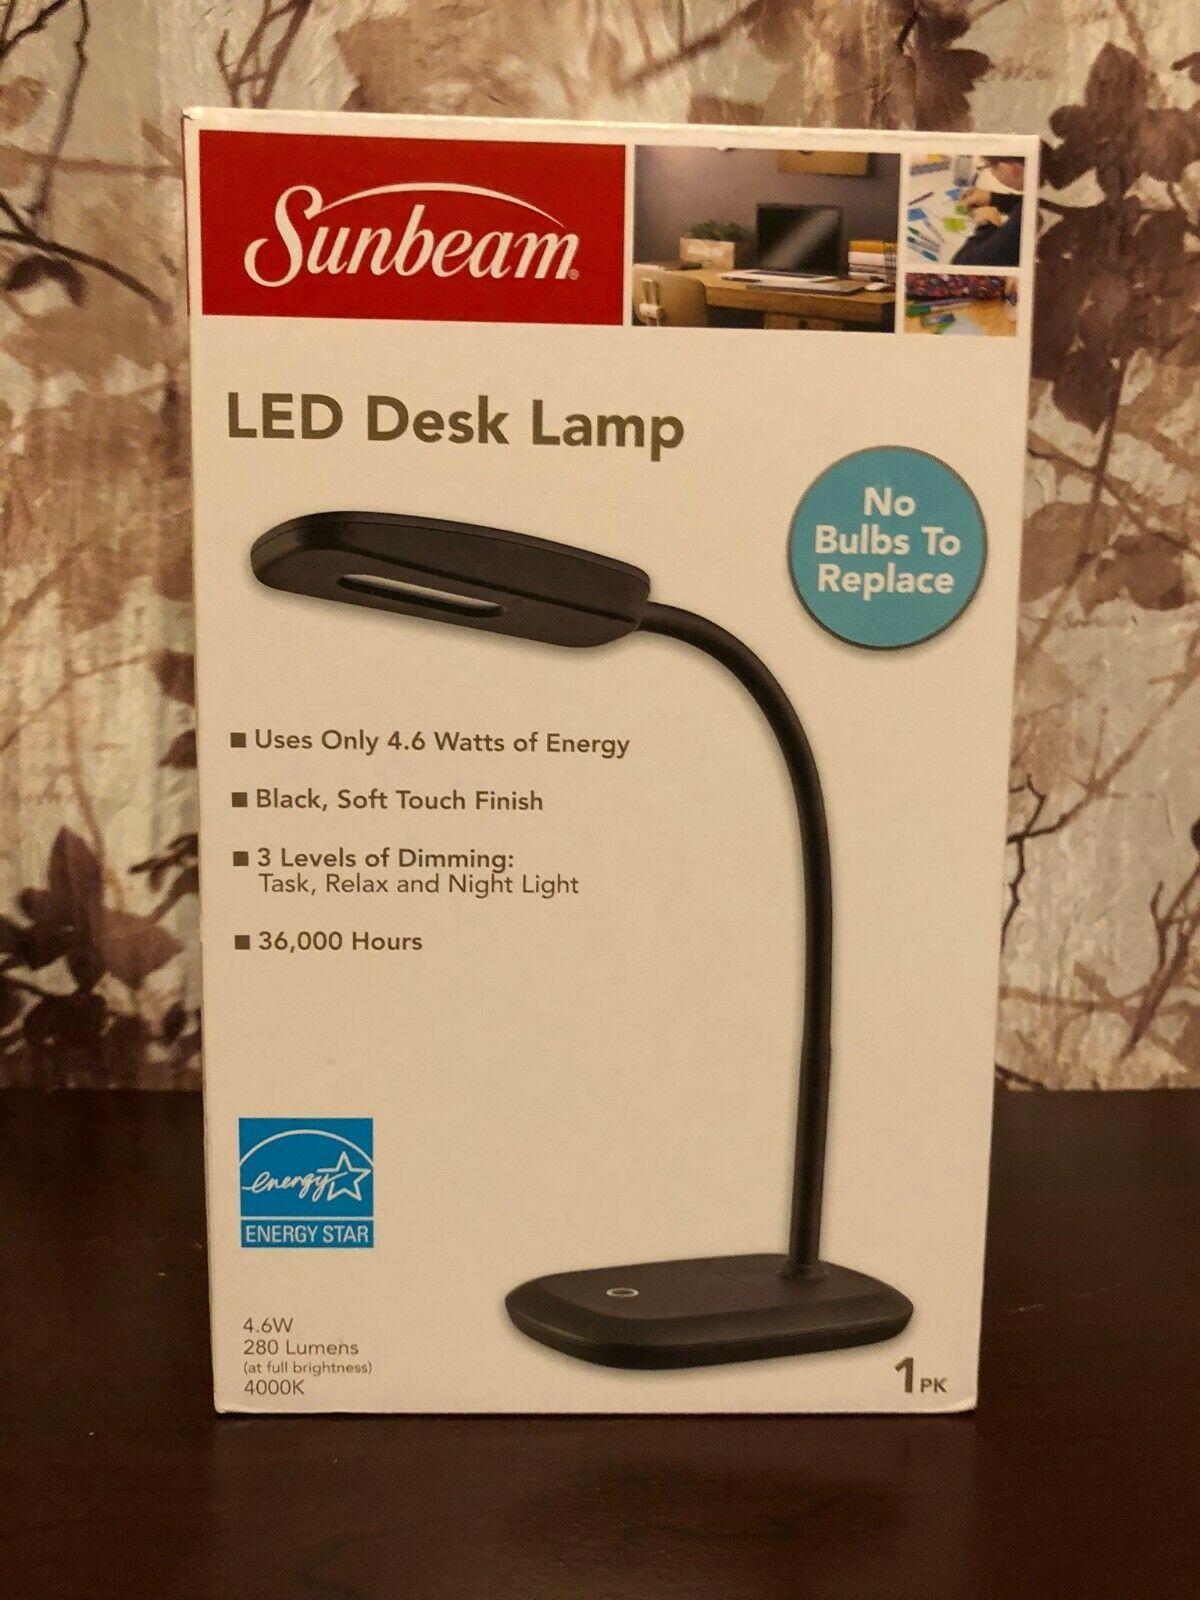 Details About Sunbeam Led Desk Lamp 3 Touch Dimming Flexible Rotating Light Energy Star Black Led Desk Lamp Black Desk Lamps Adjustable Lighting